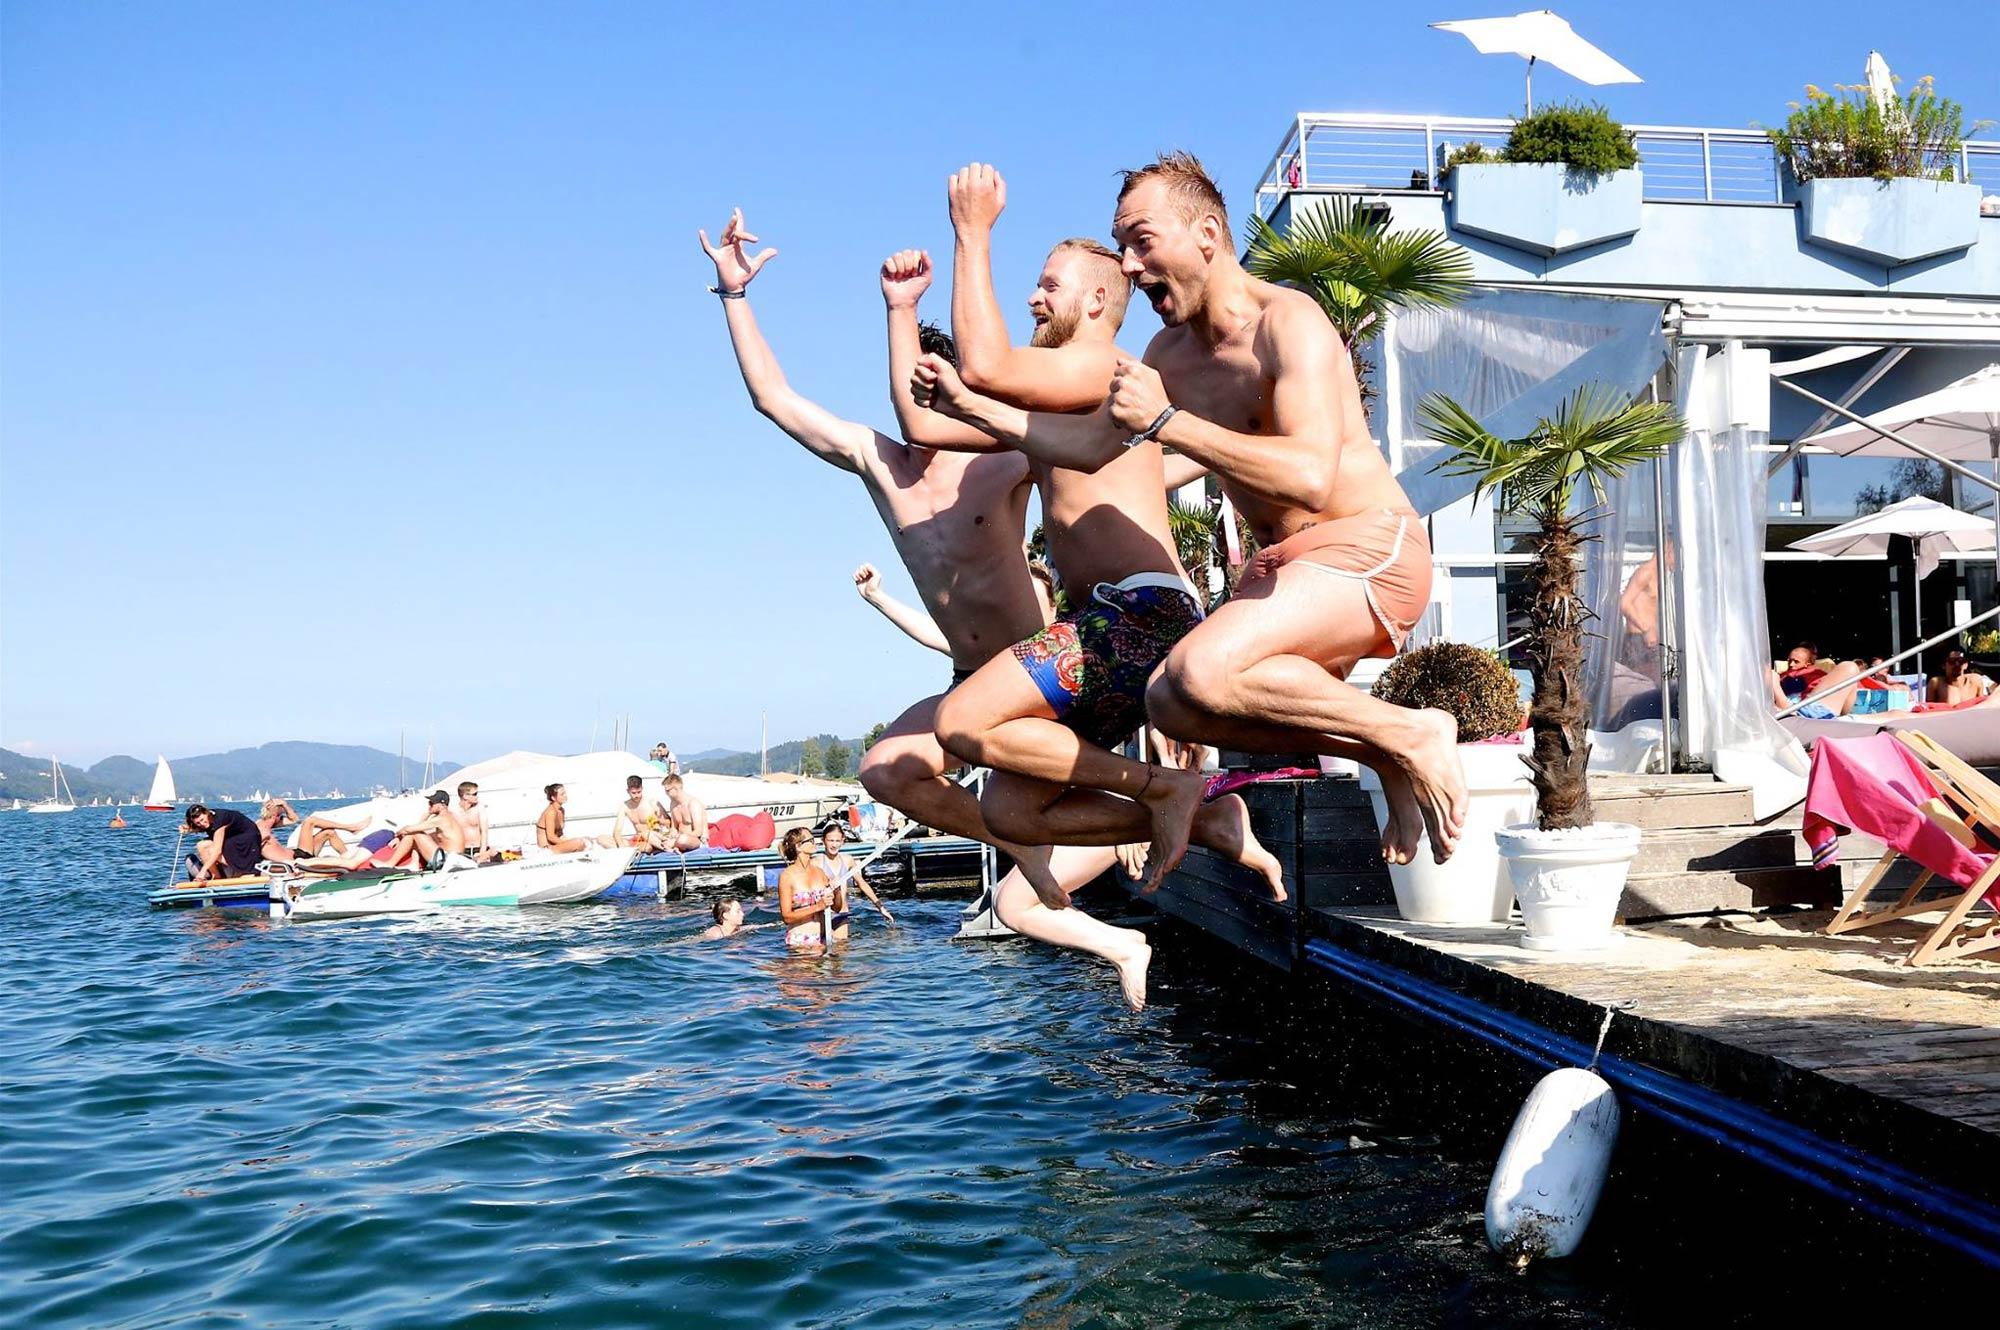 Gay Travel Blogger Pink Lake Festival Austria © Coupleofmen.com